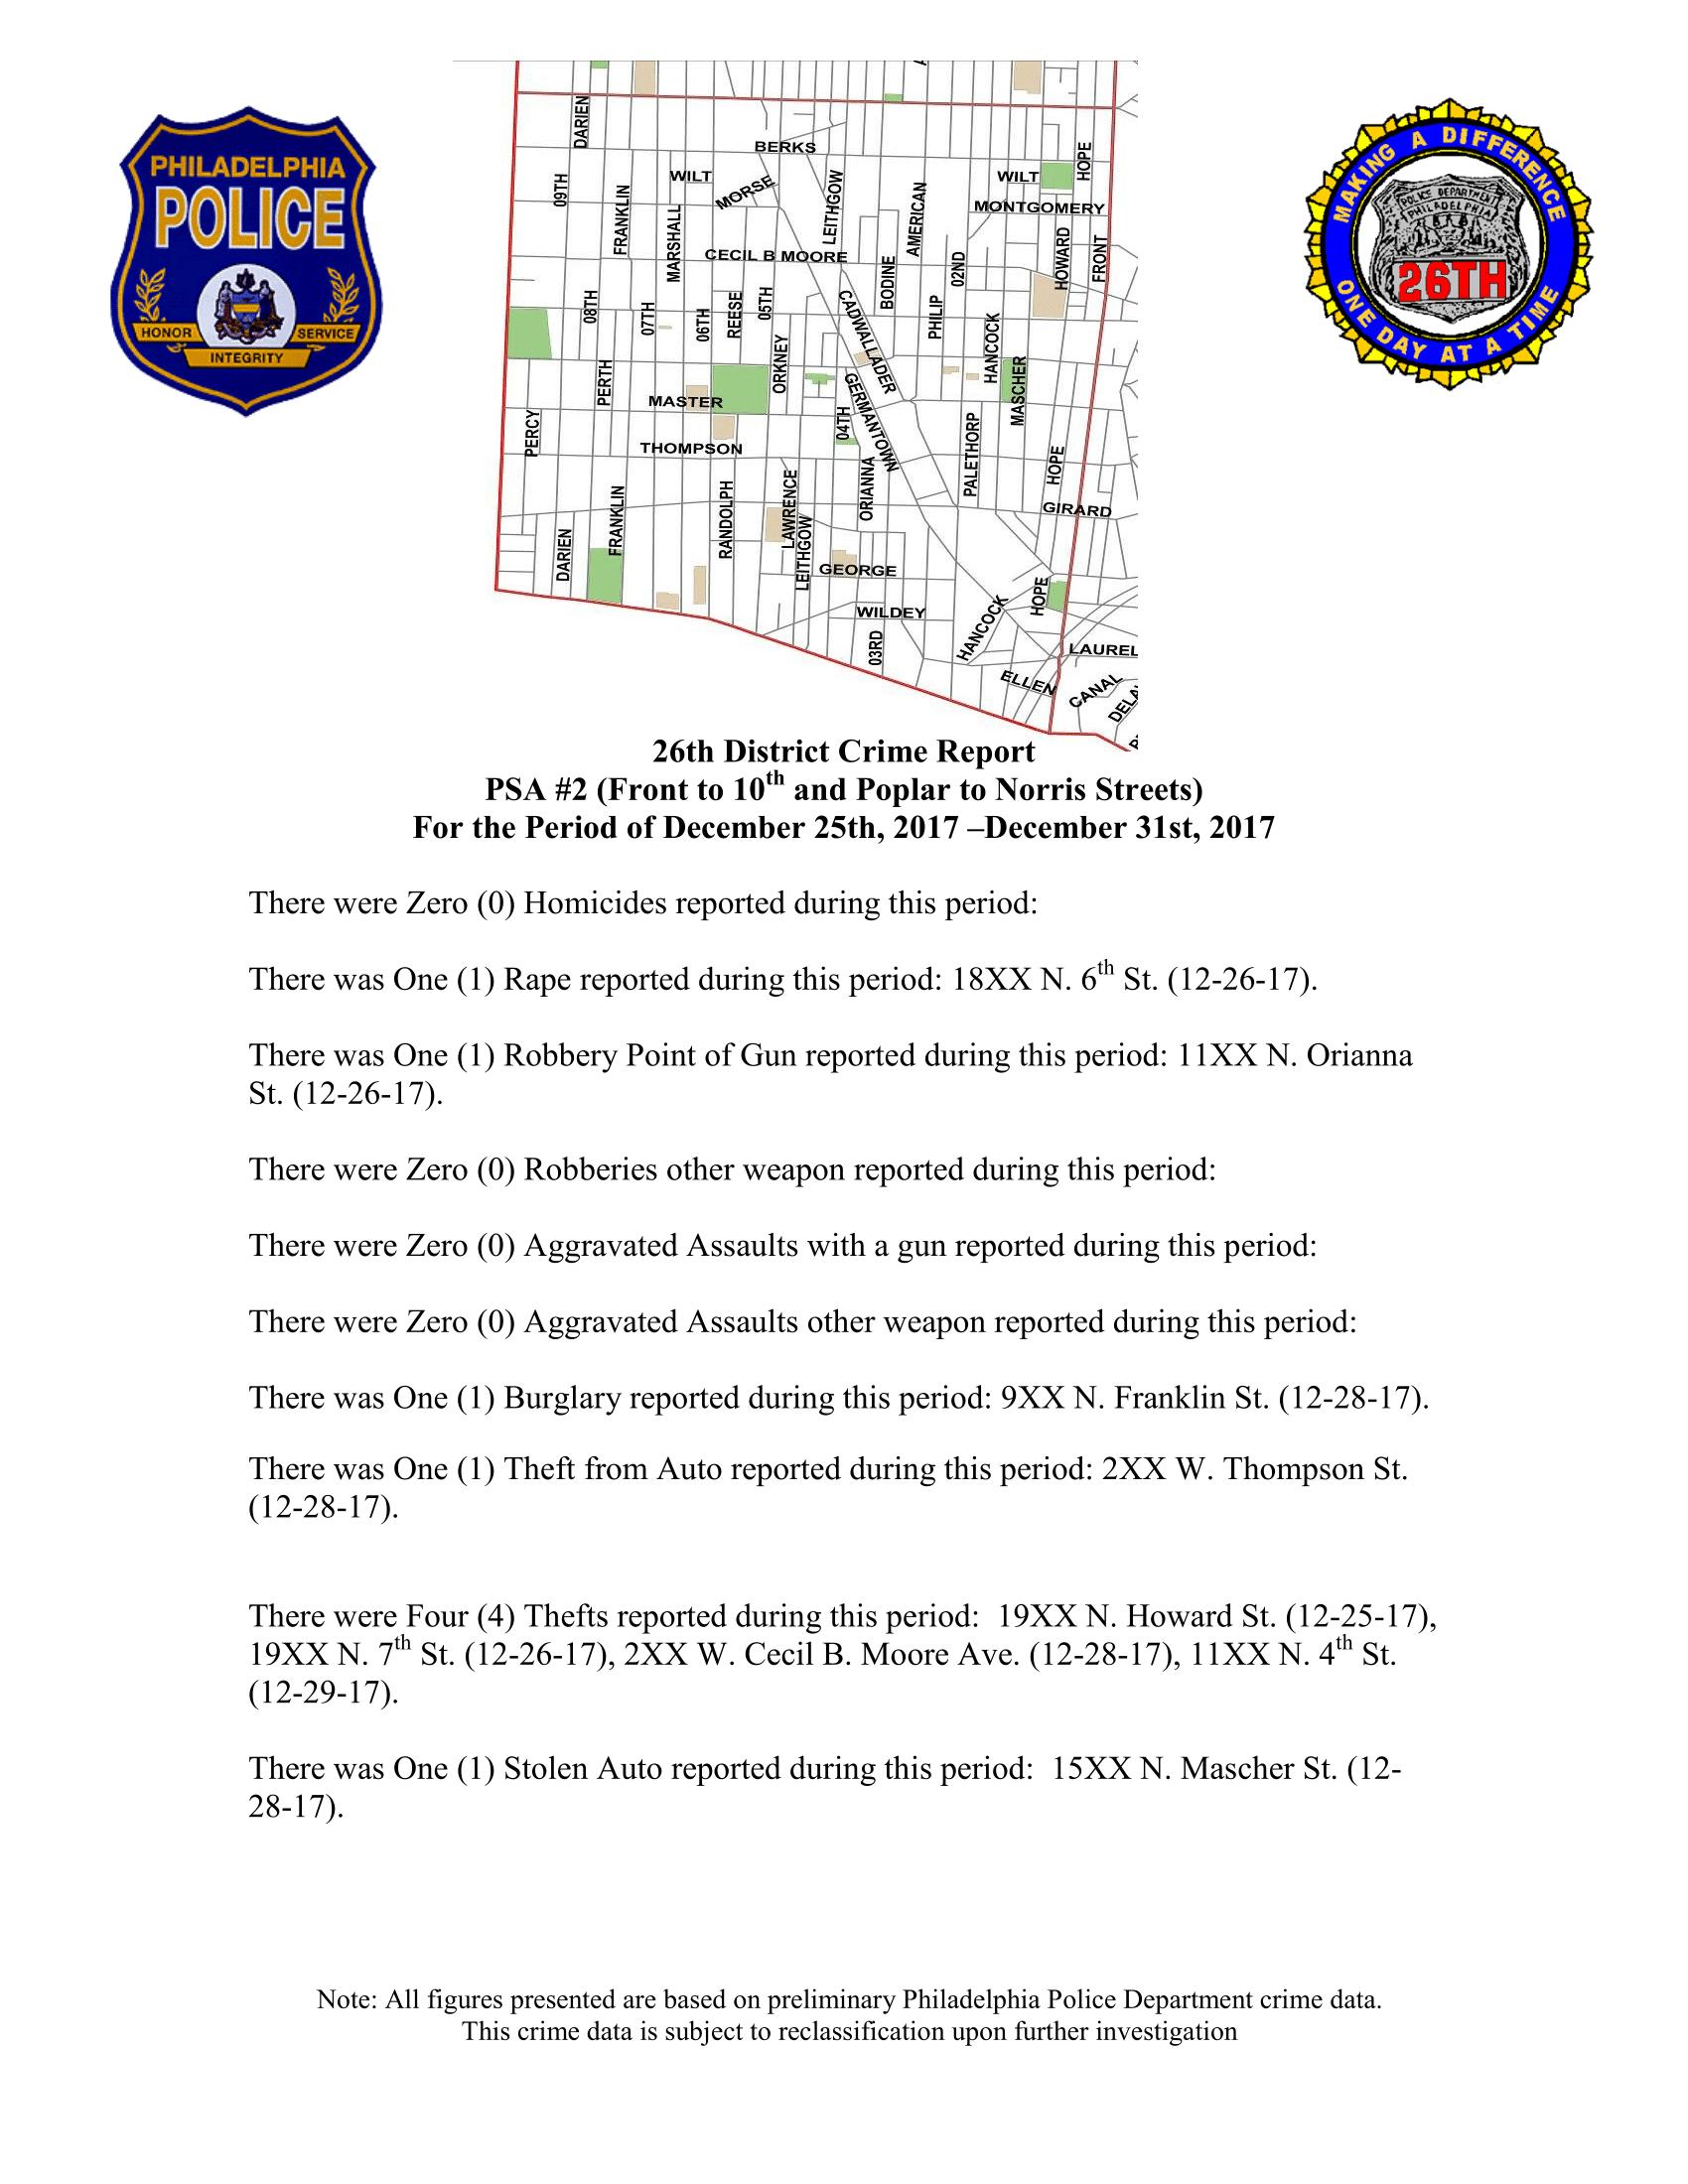 PSA #2 12-31-17-1.png